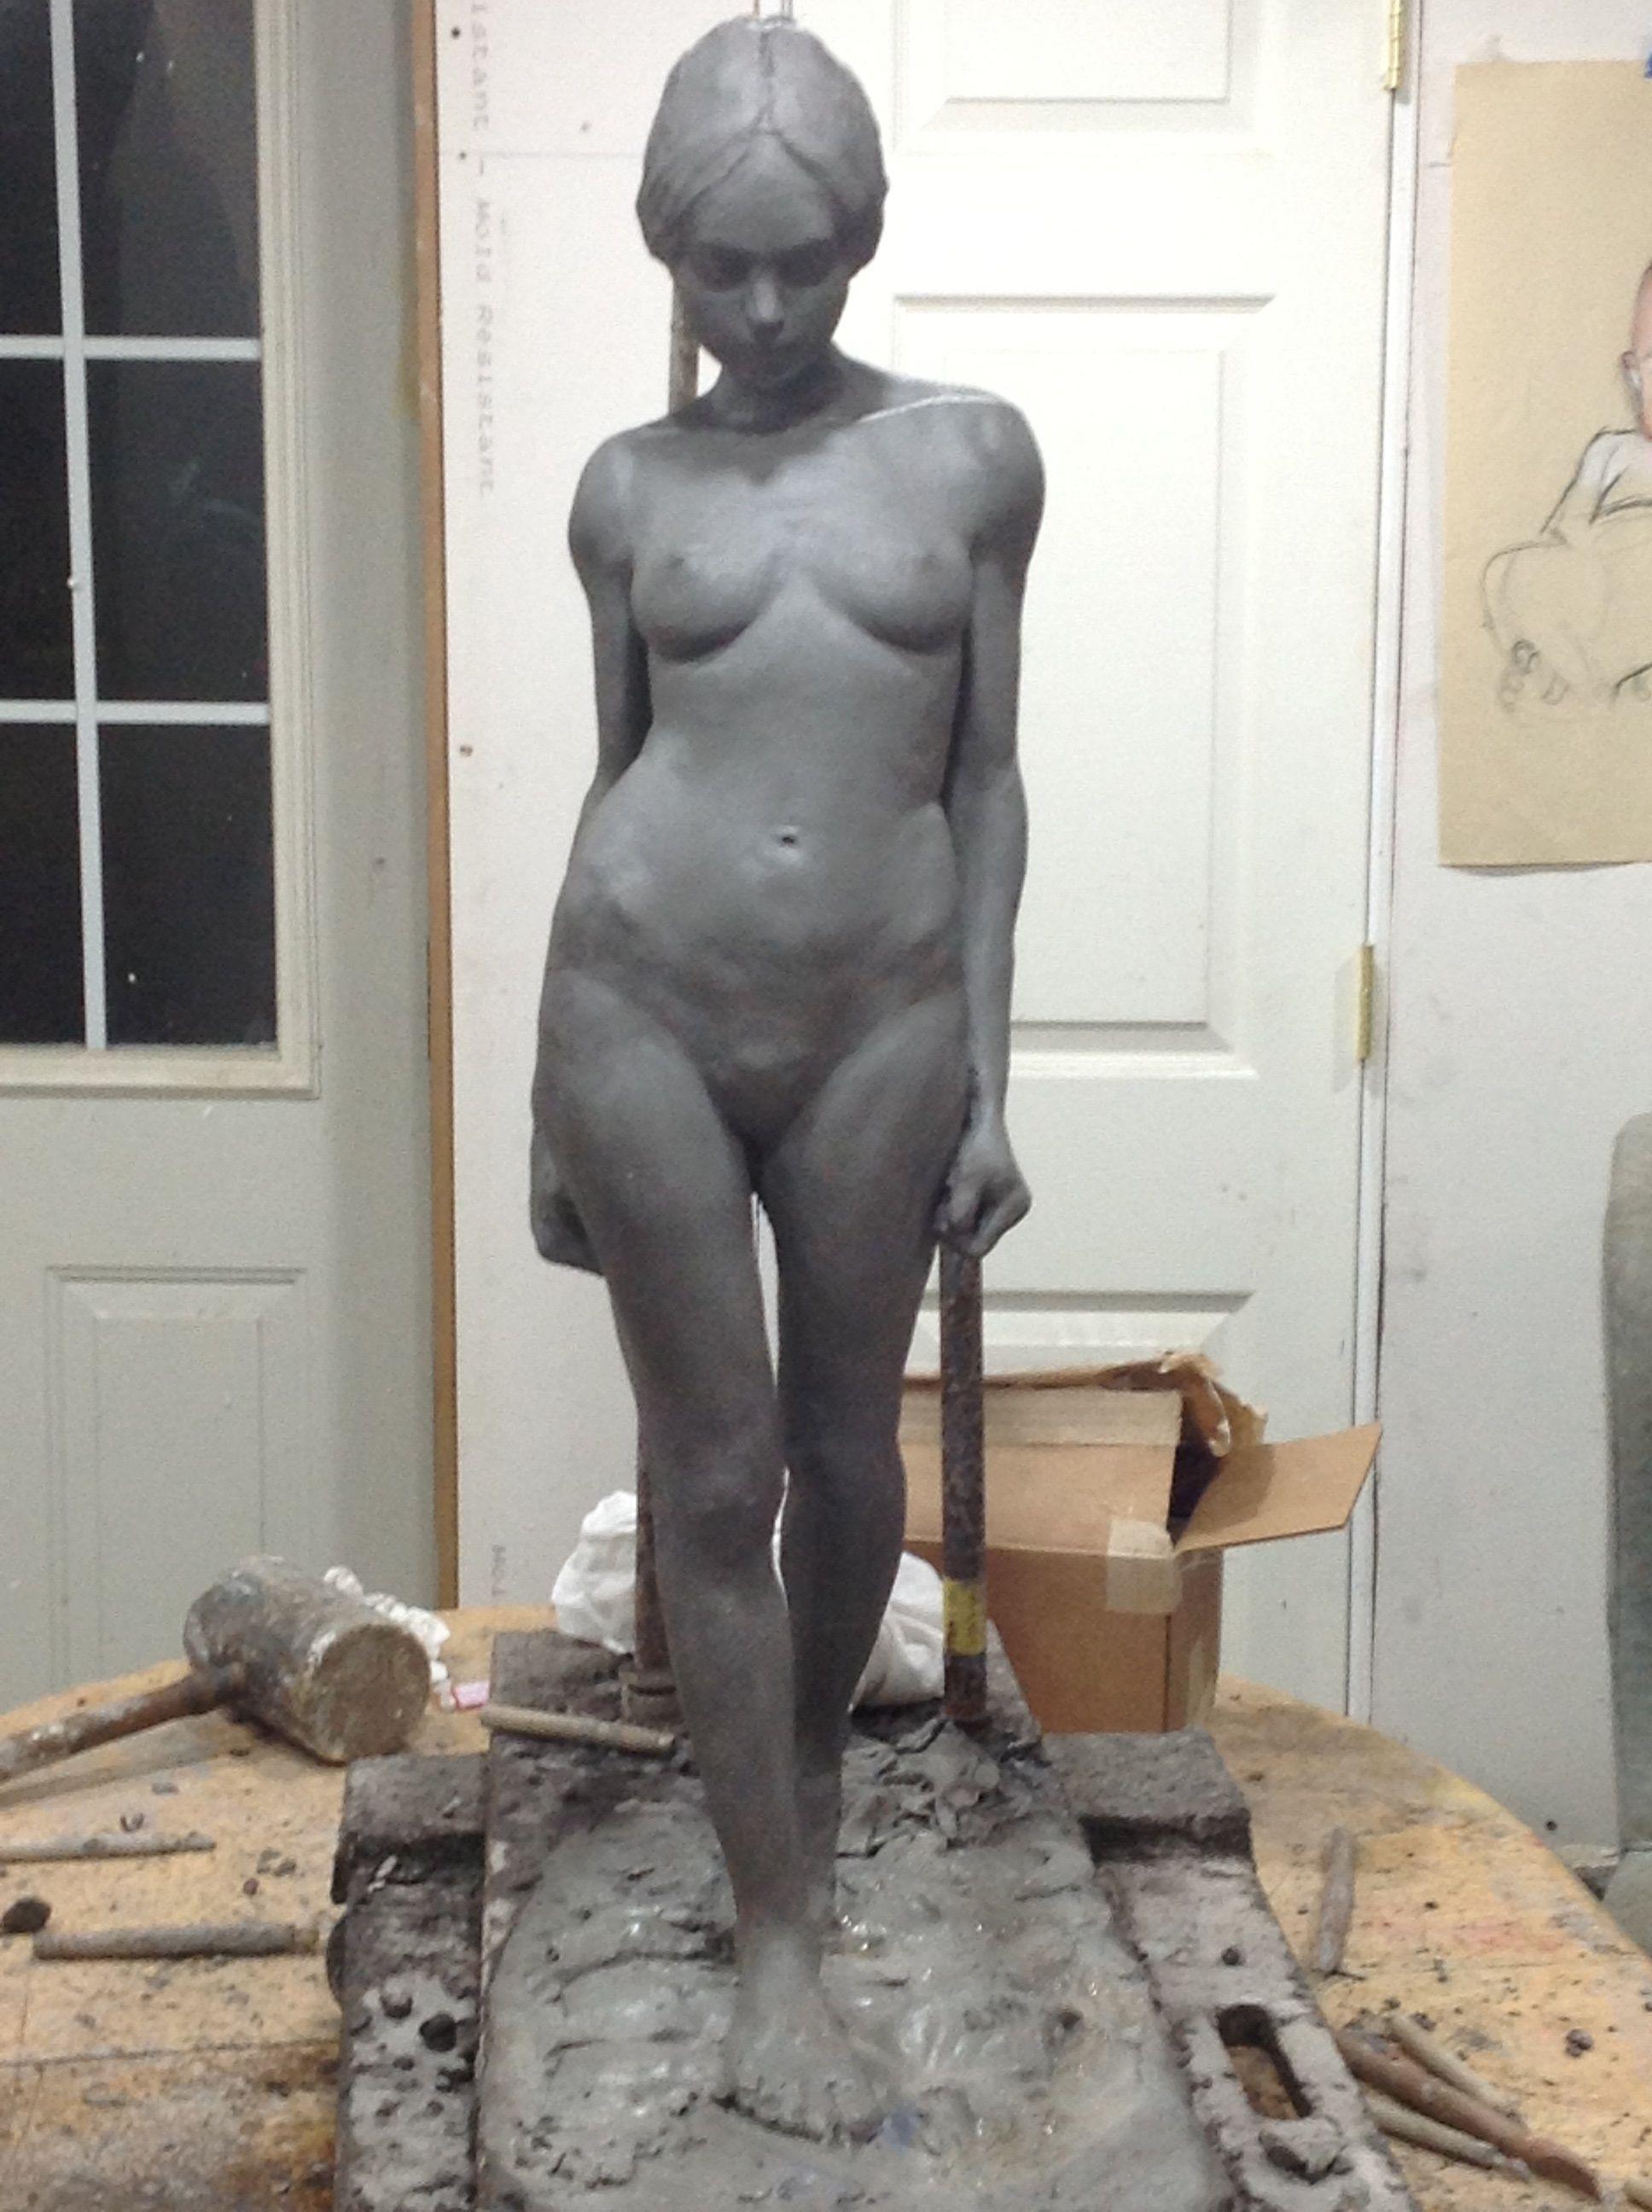 Pin de Lov2befree en Statues & Art   Pinterest   Escultura, Anatomía ...